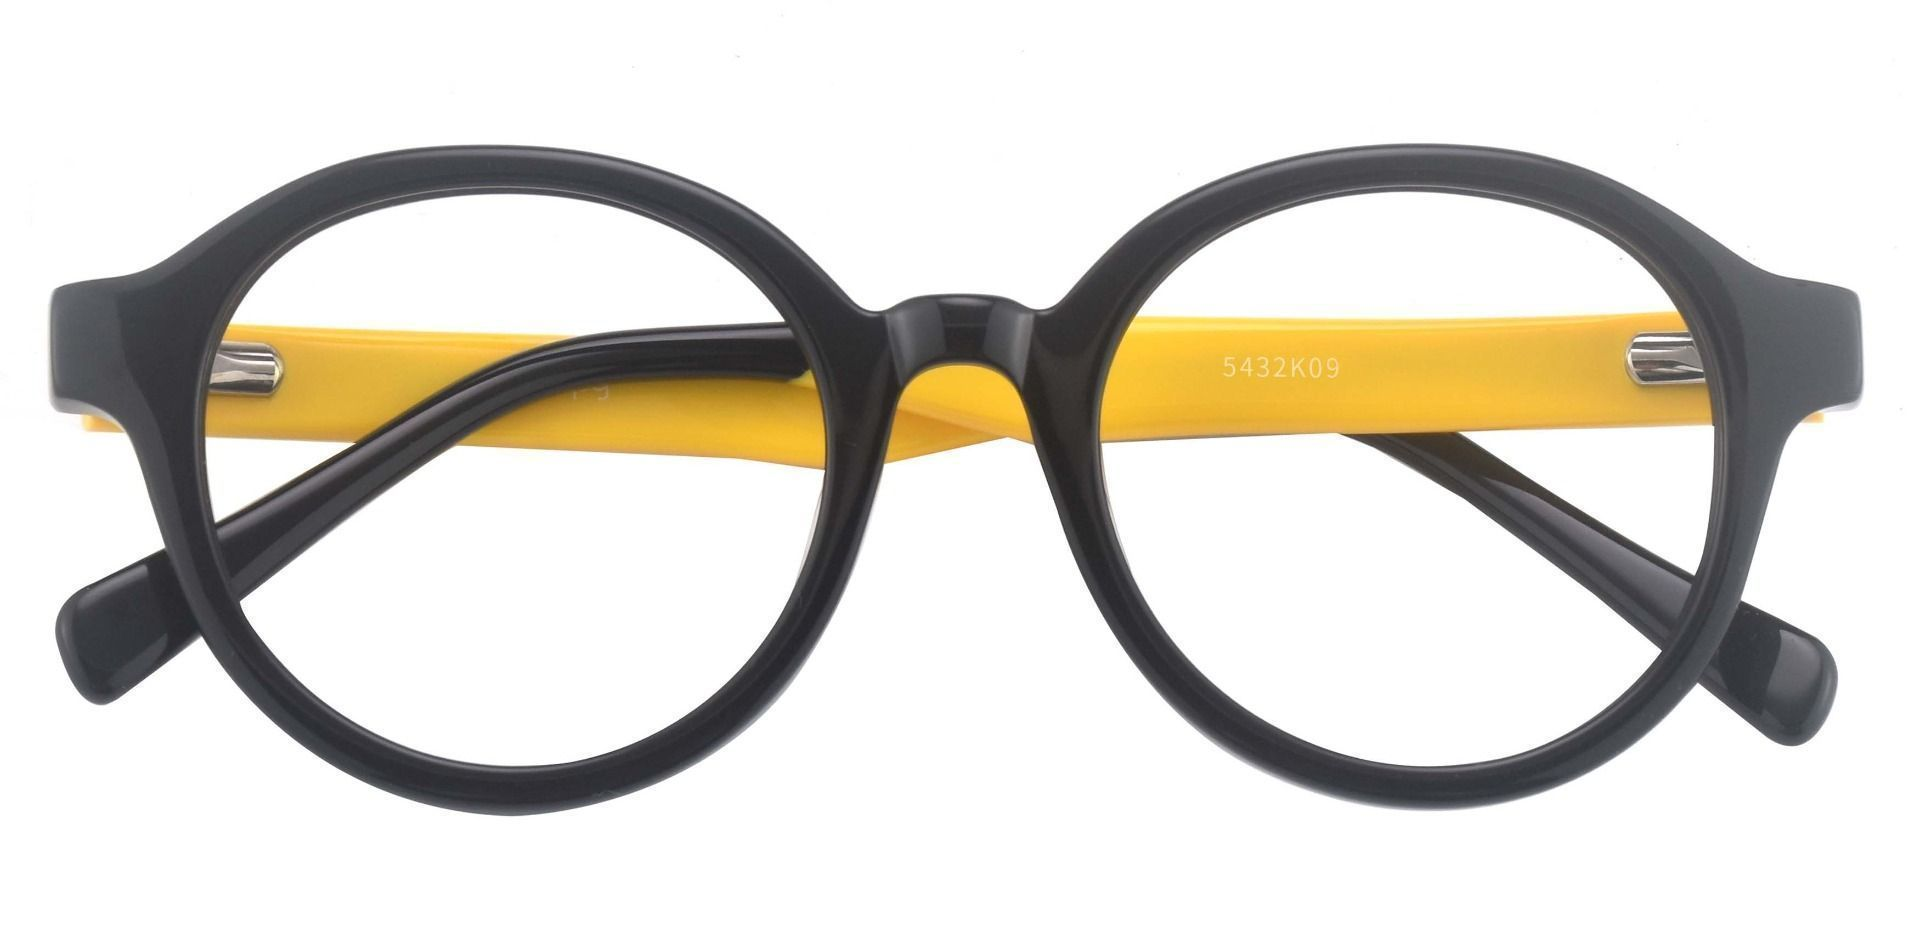 Champ Round Progressive Glasses - The Frame Is Black And Gold